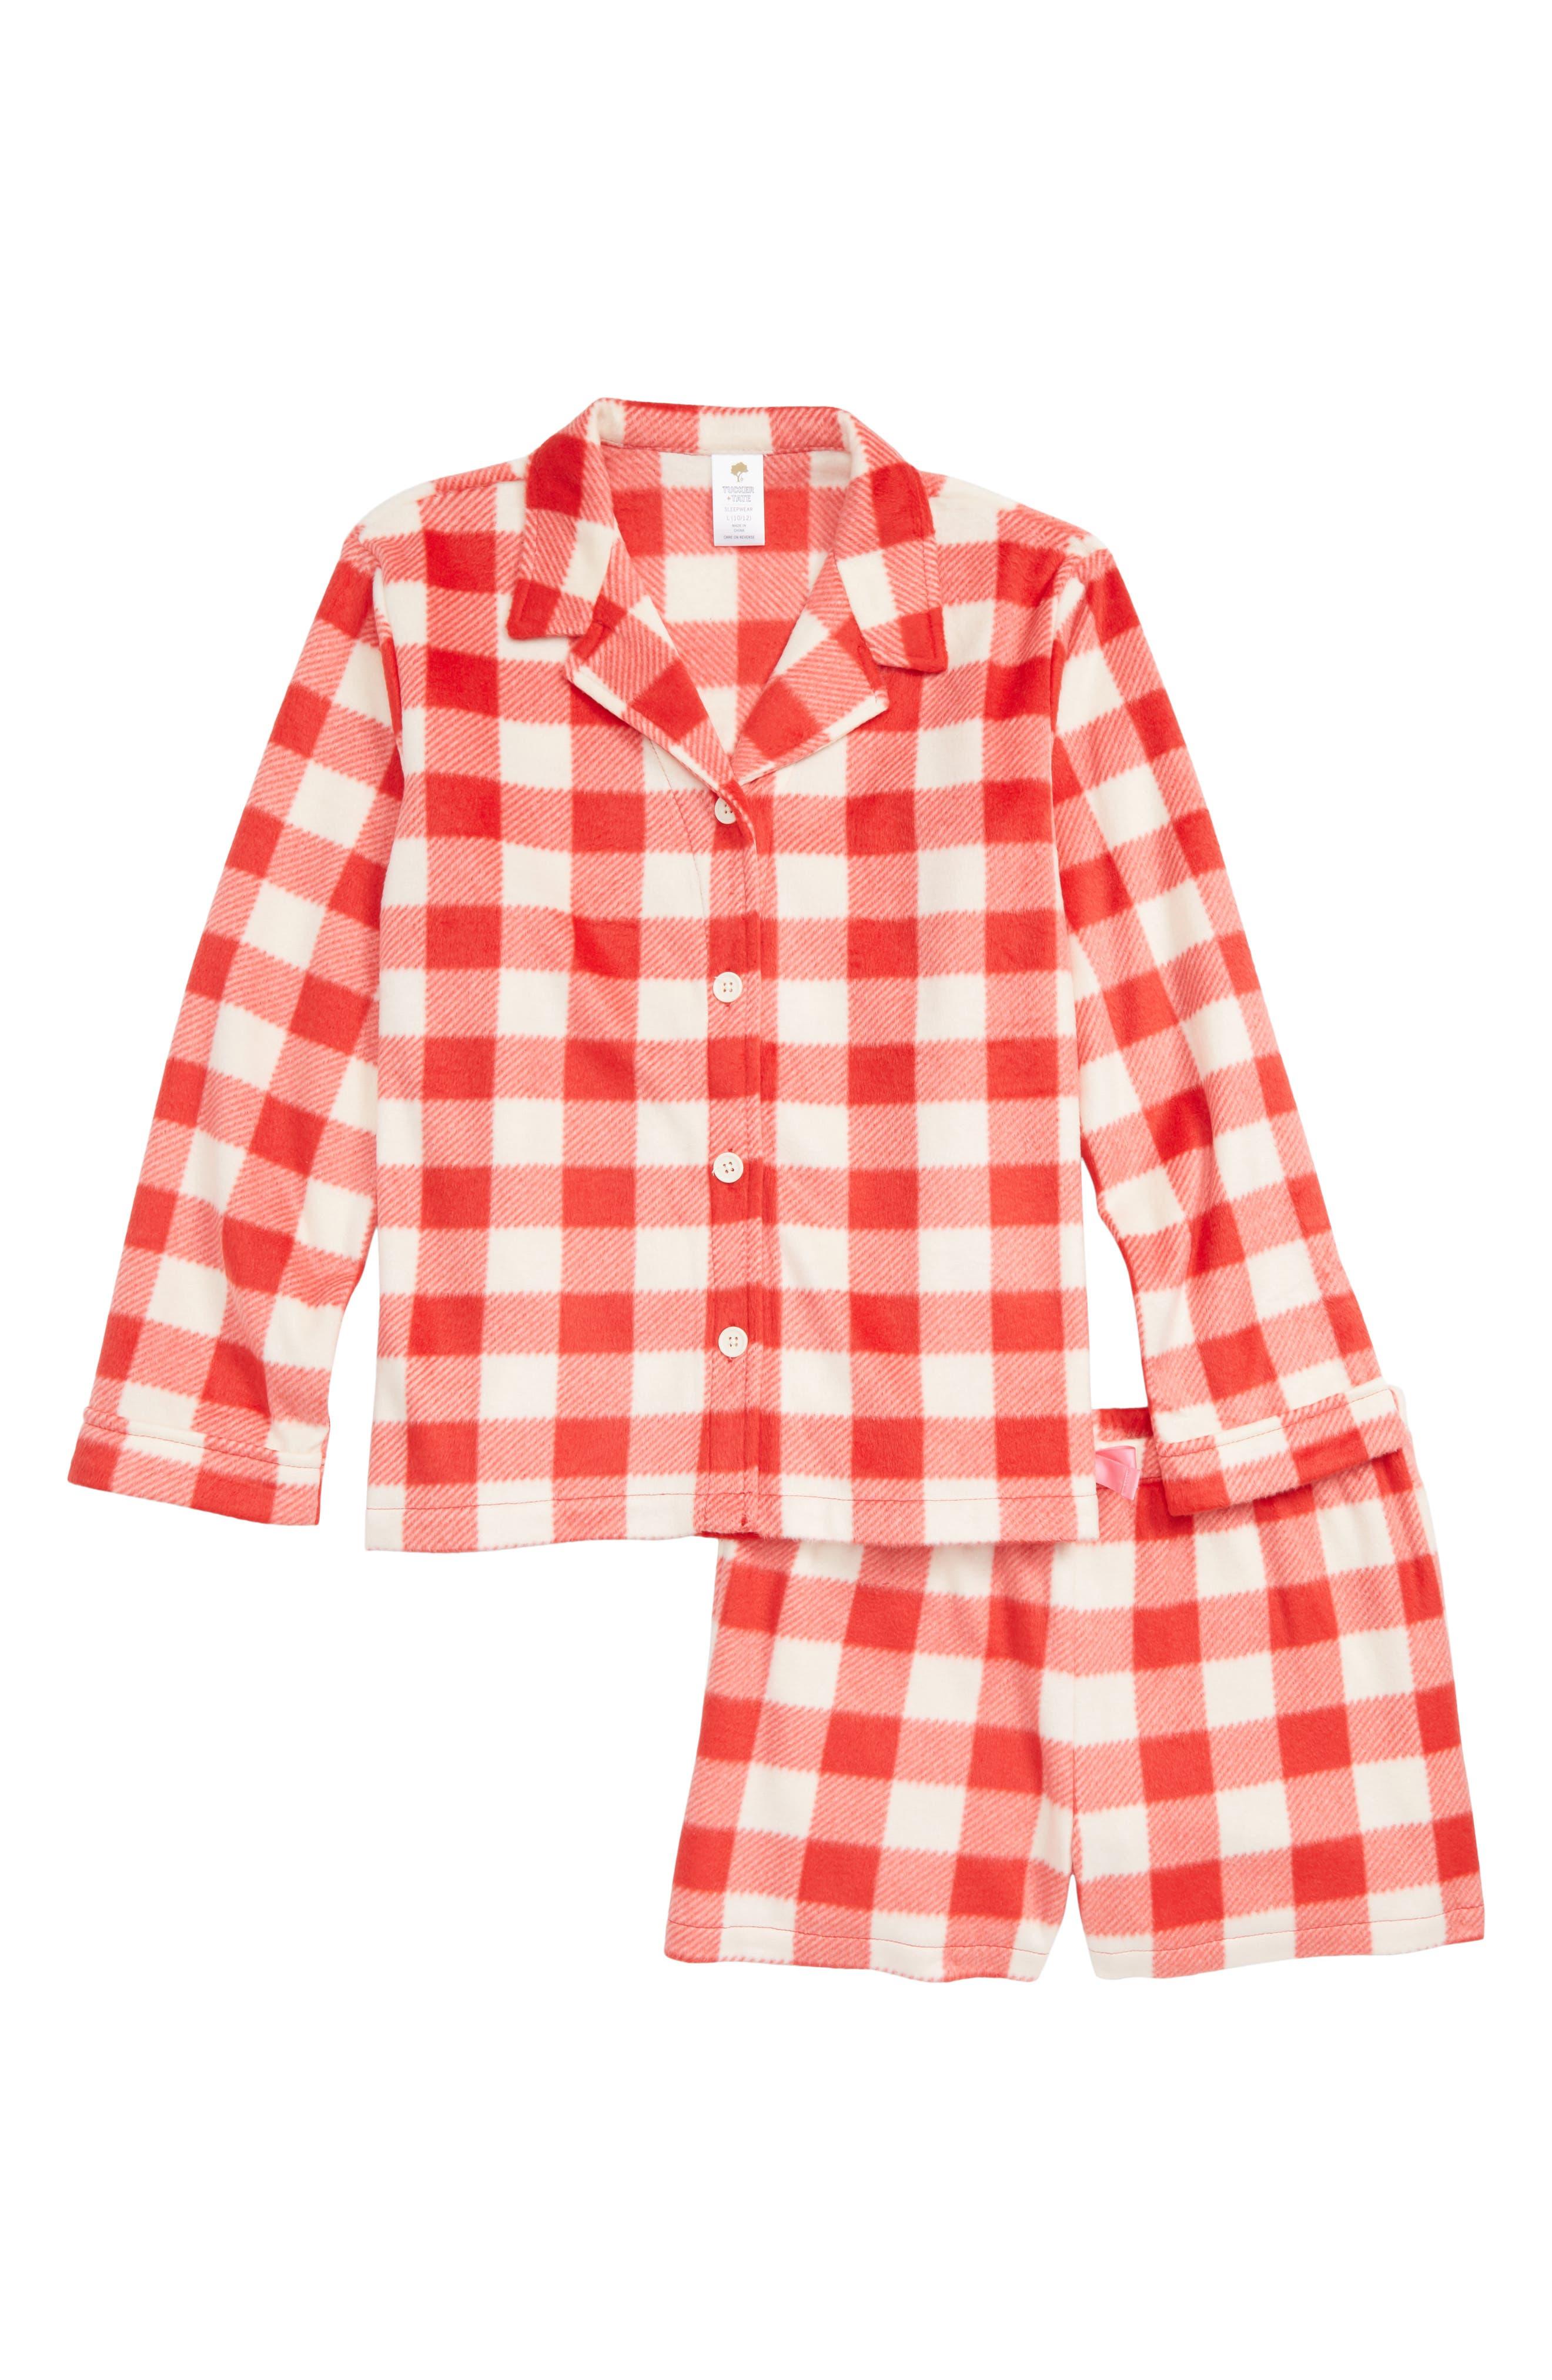 Collared Fleece Pajamas,                             Main thumbnail 1, color,                             RED BLOOM CHECK